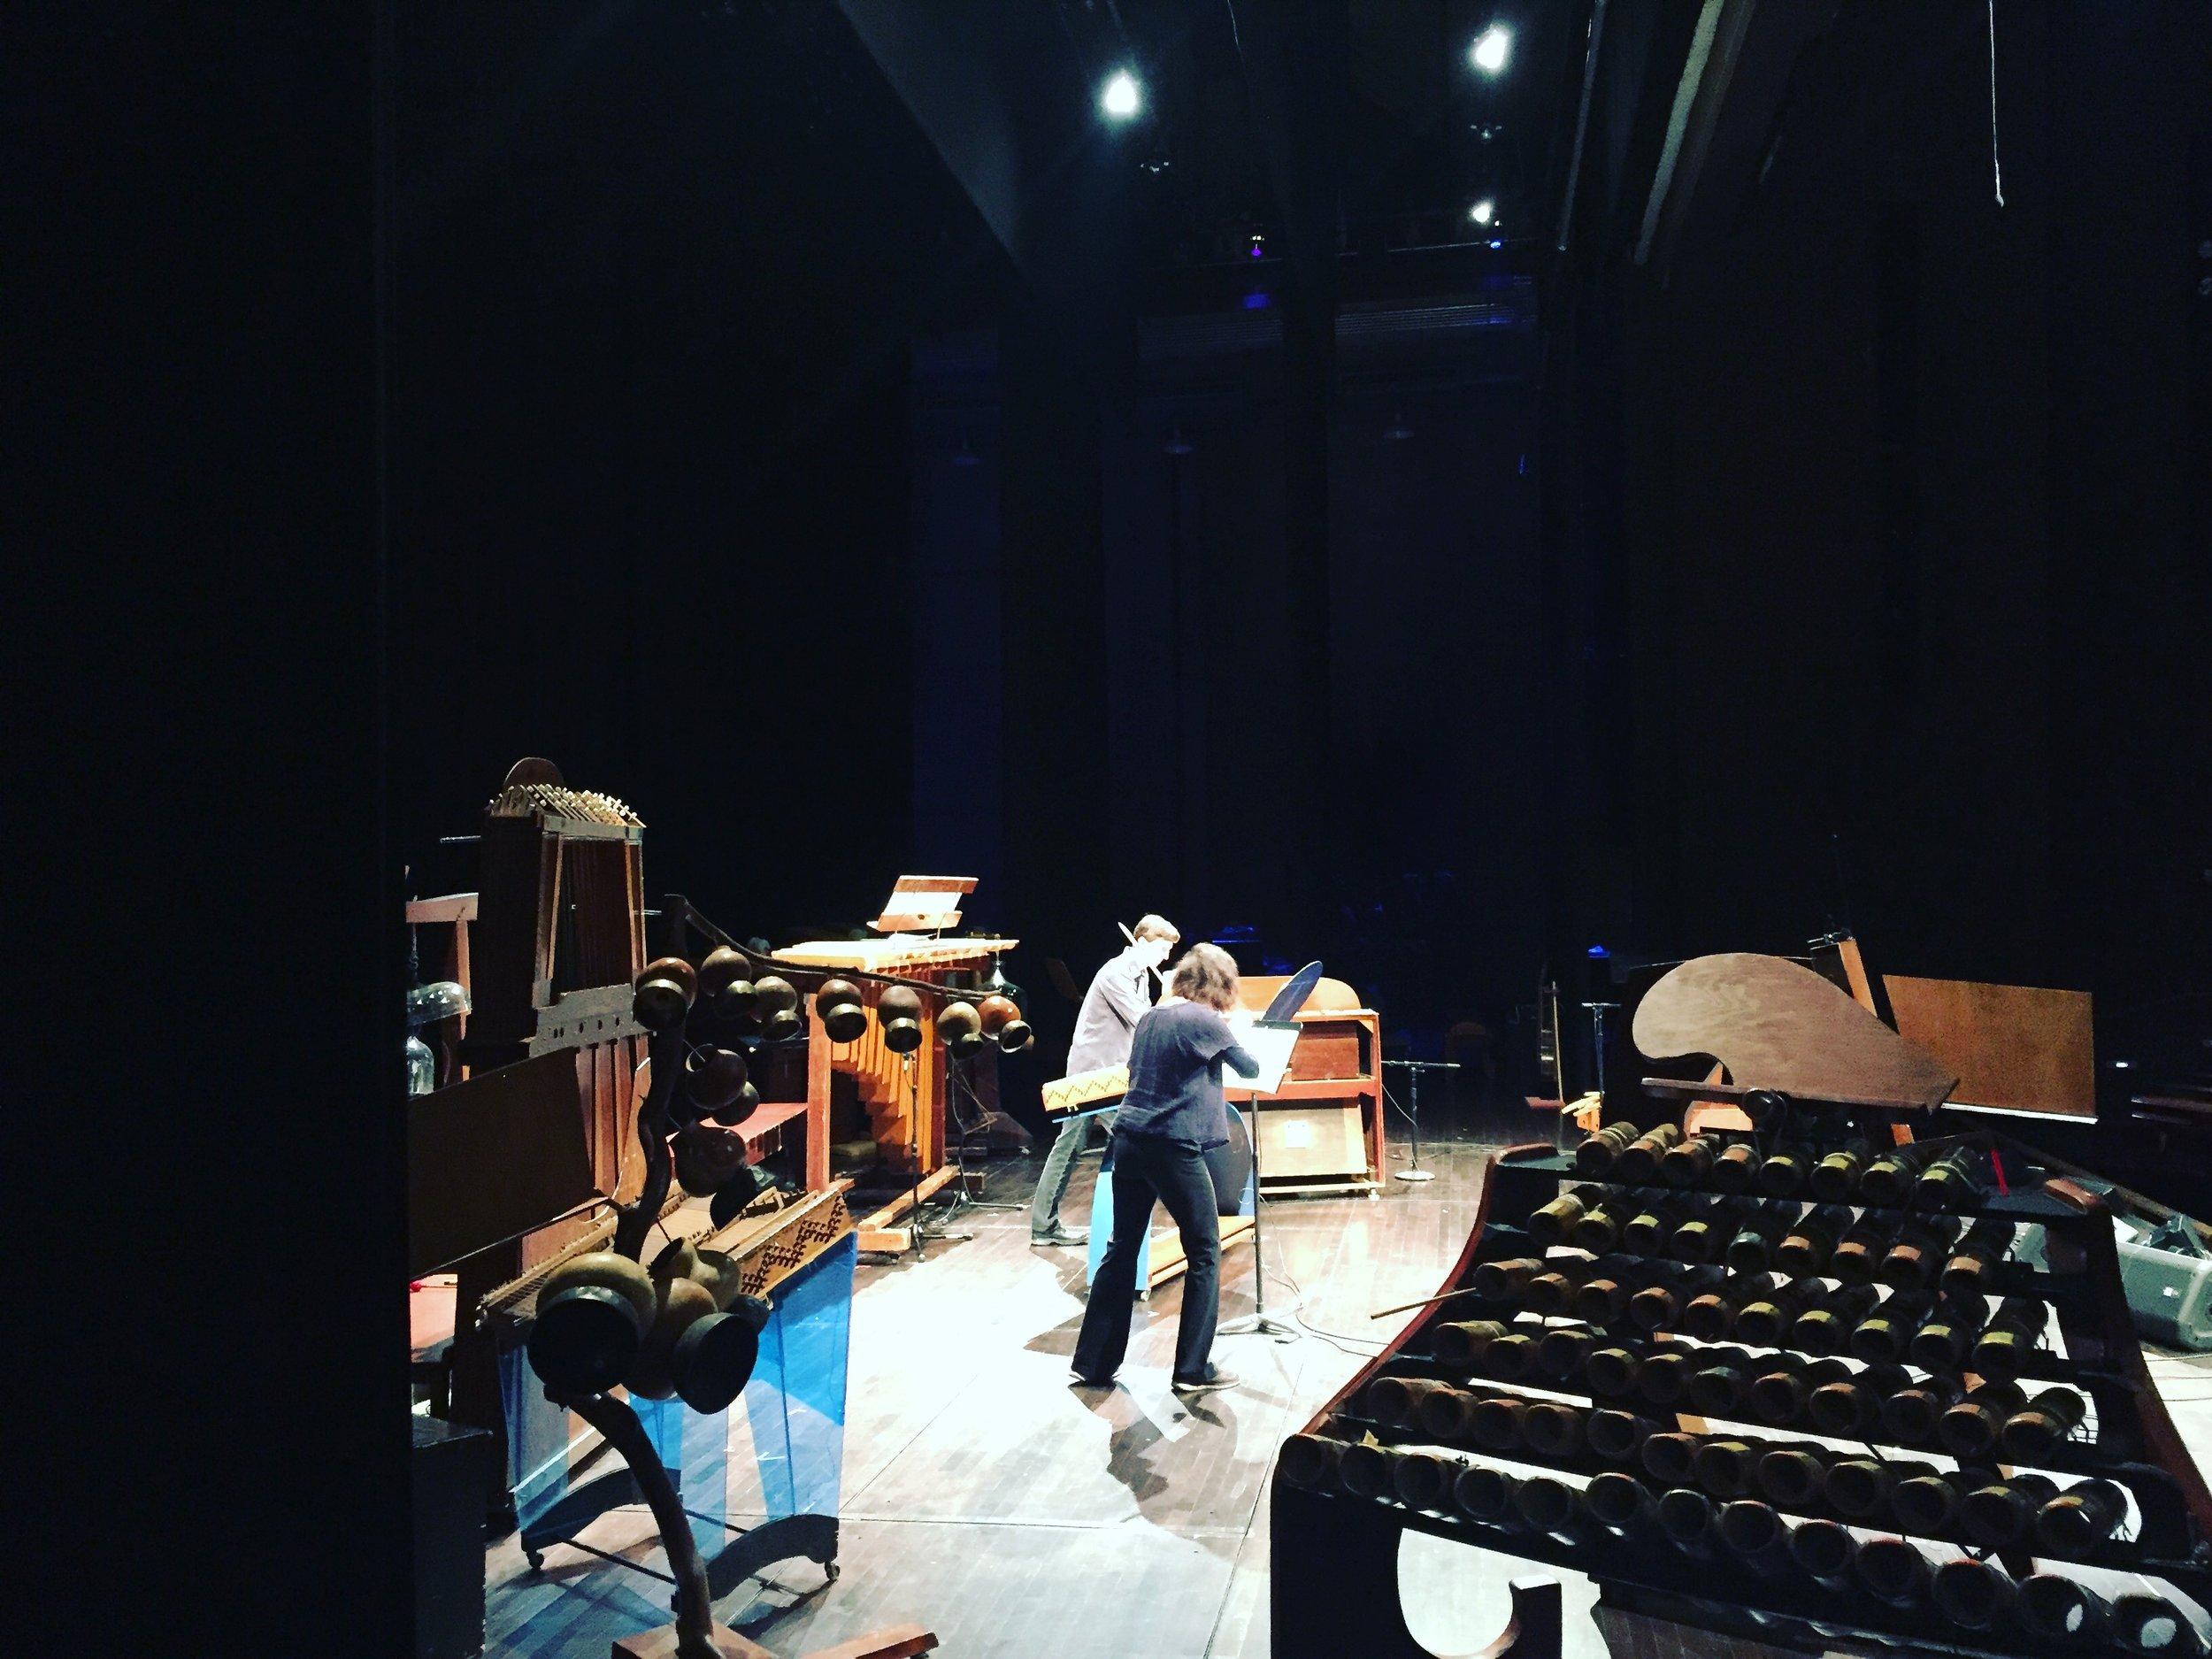 Melia Watras and Charles Corey rehearsing  In Paradisum  Photo by Michael Jinsoo Lim